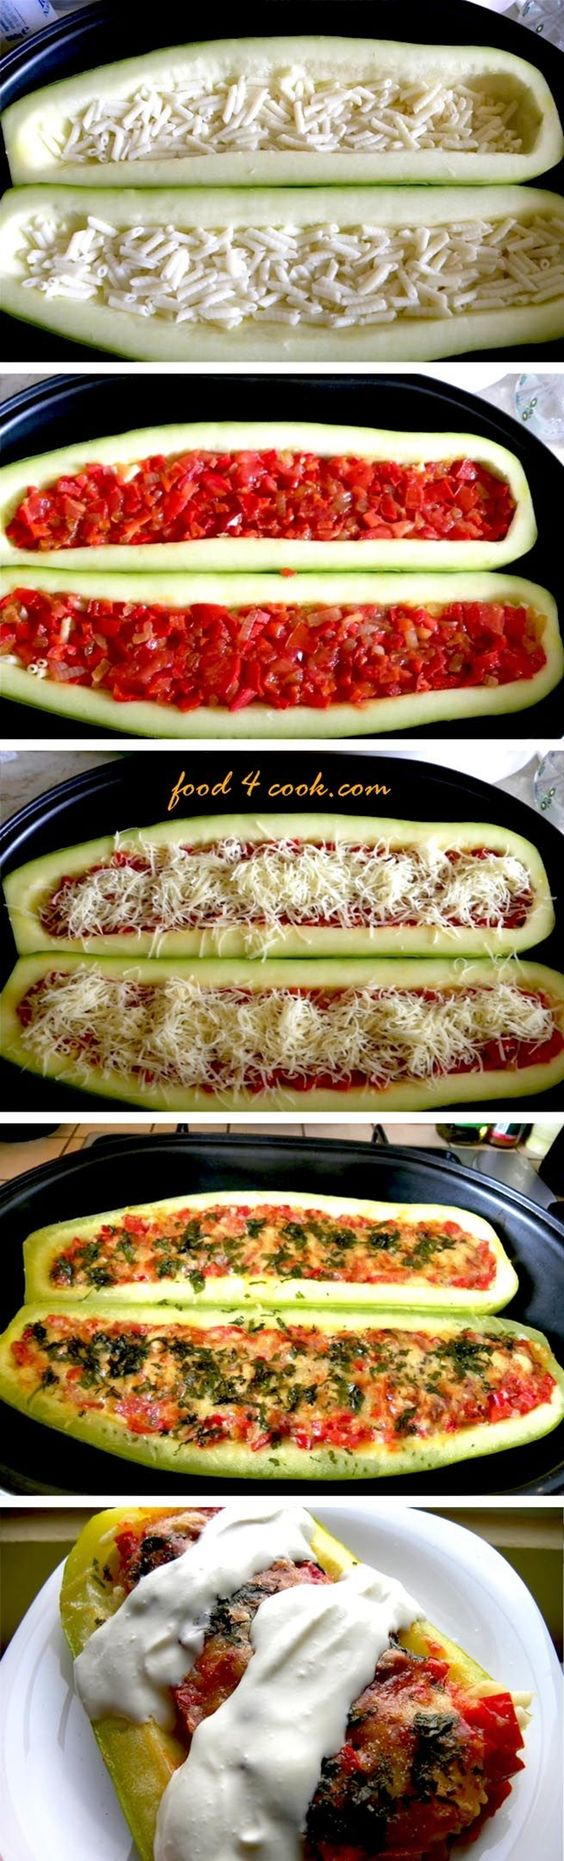 Stuffed Zucchini- would be super easy to make: